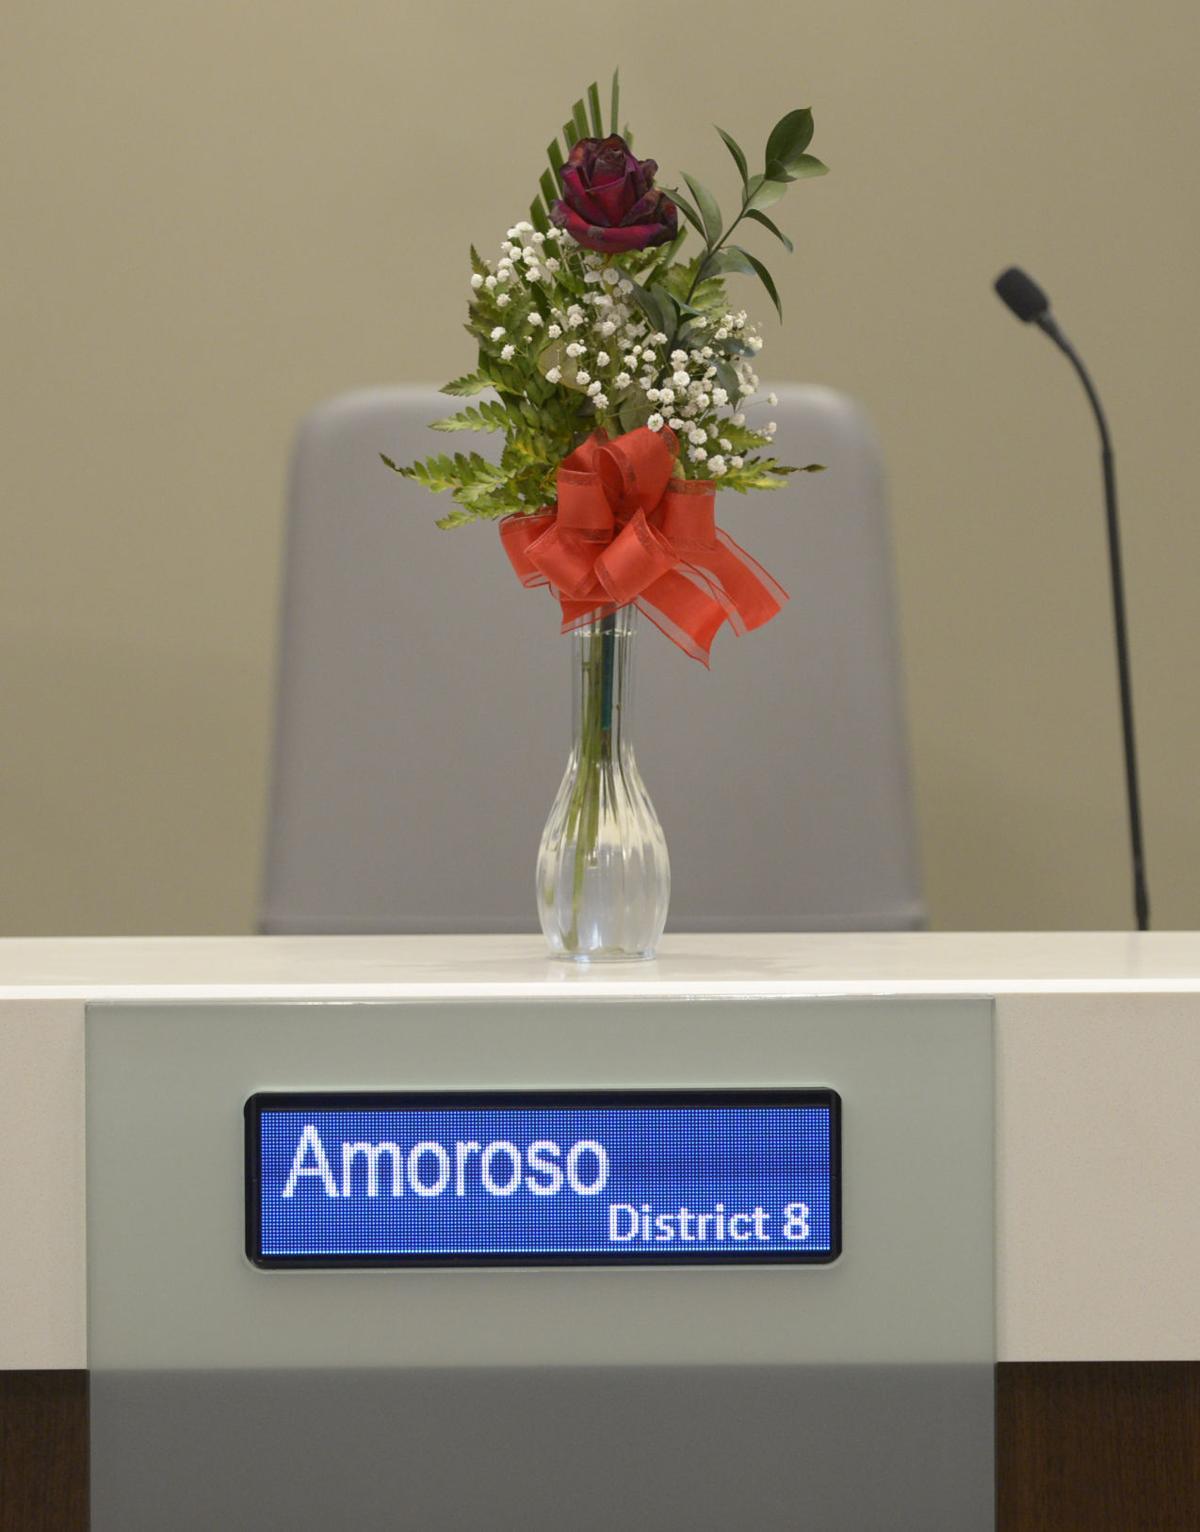 br.councilamoroso.adv HS 0189.JPG